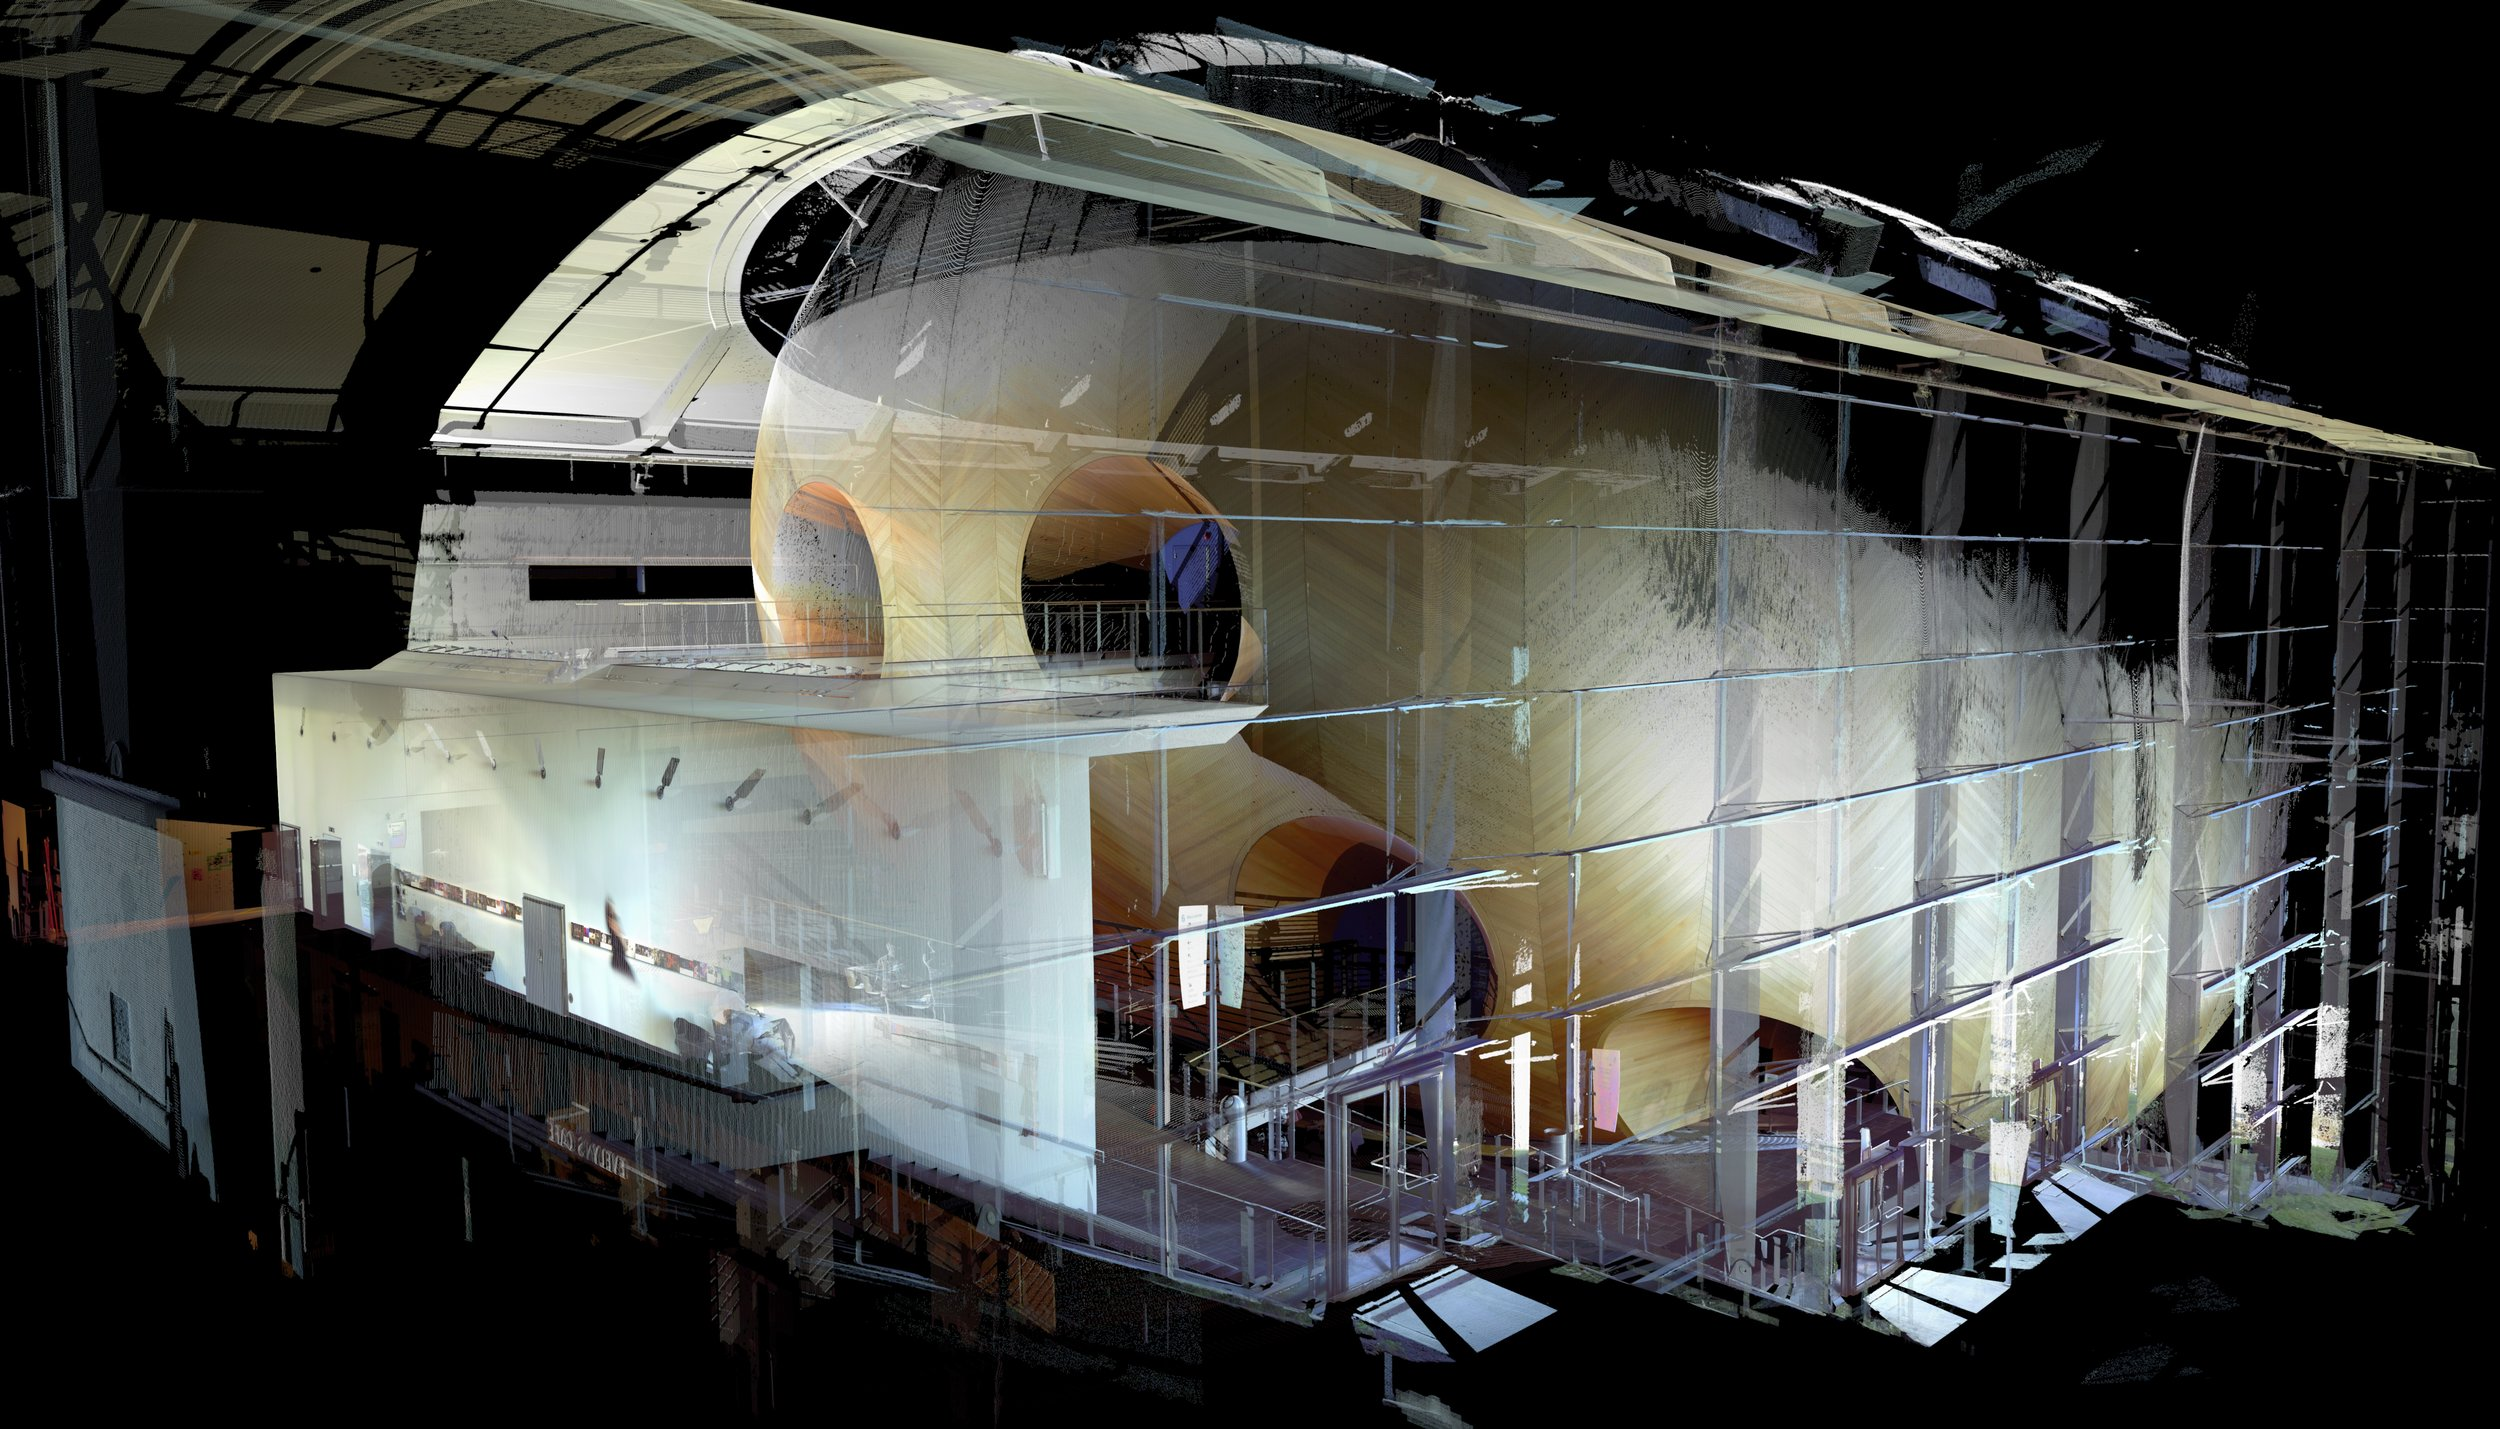 MYNDWORKSHOP_rensselaer-polytechnic-institute-3D-laser-scanning-point-cloud-new-york-EMPAC-2.jpg